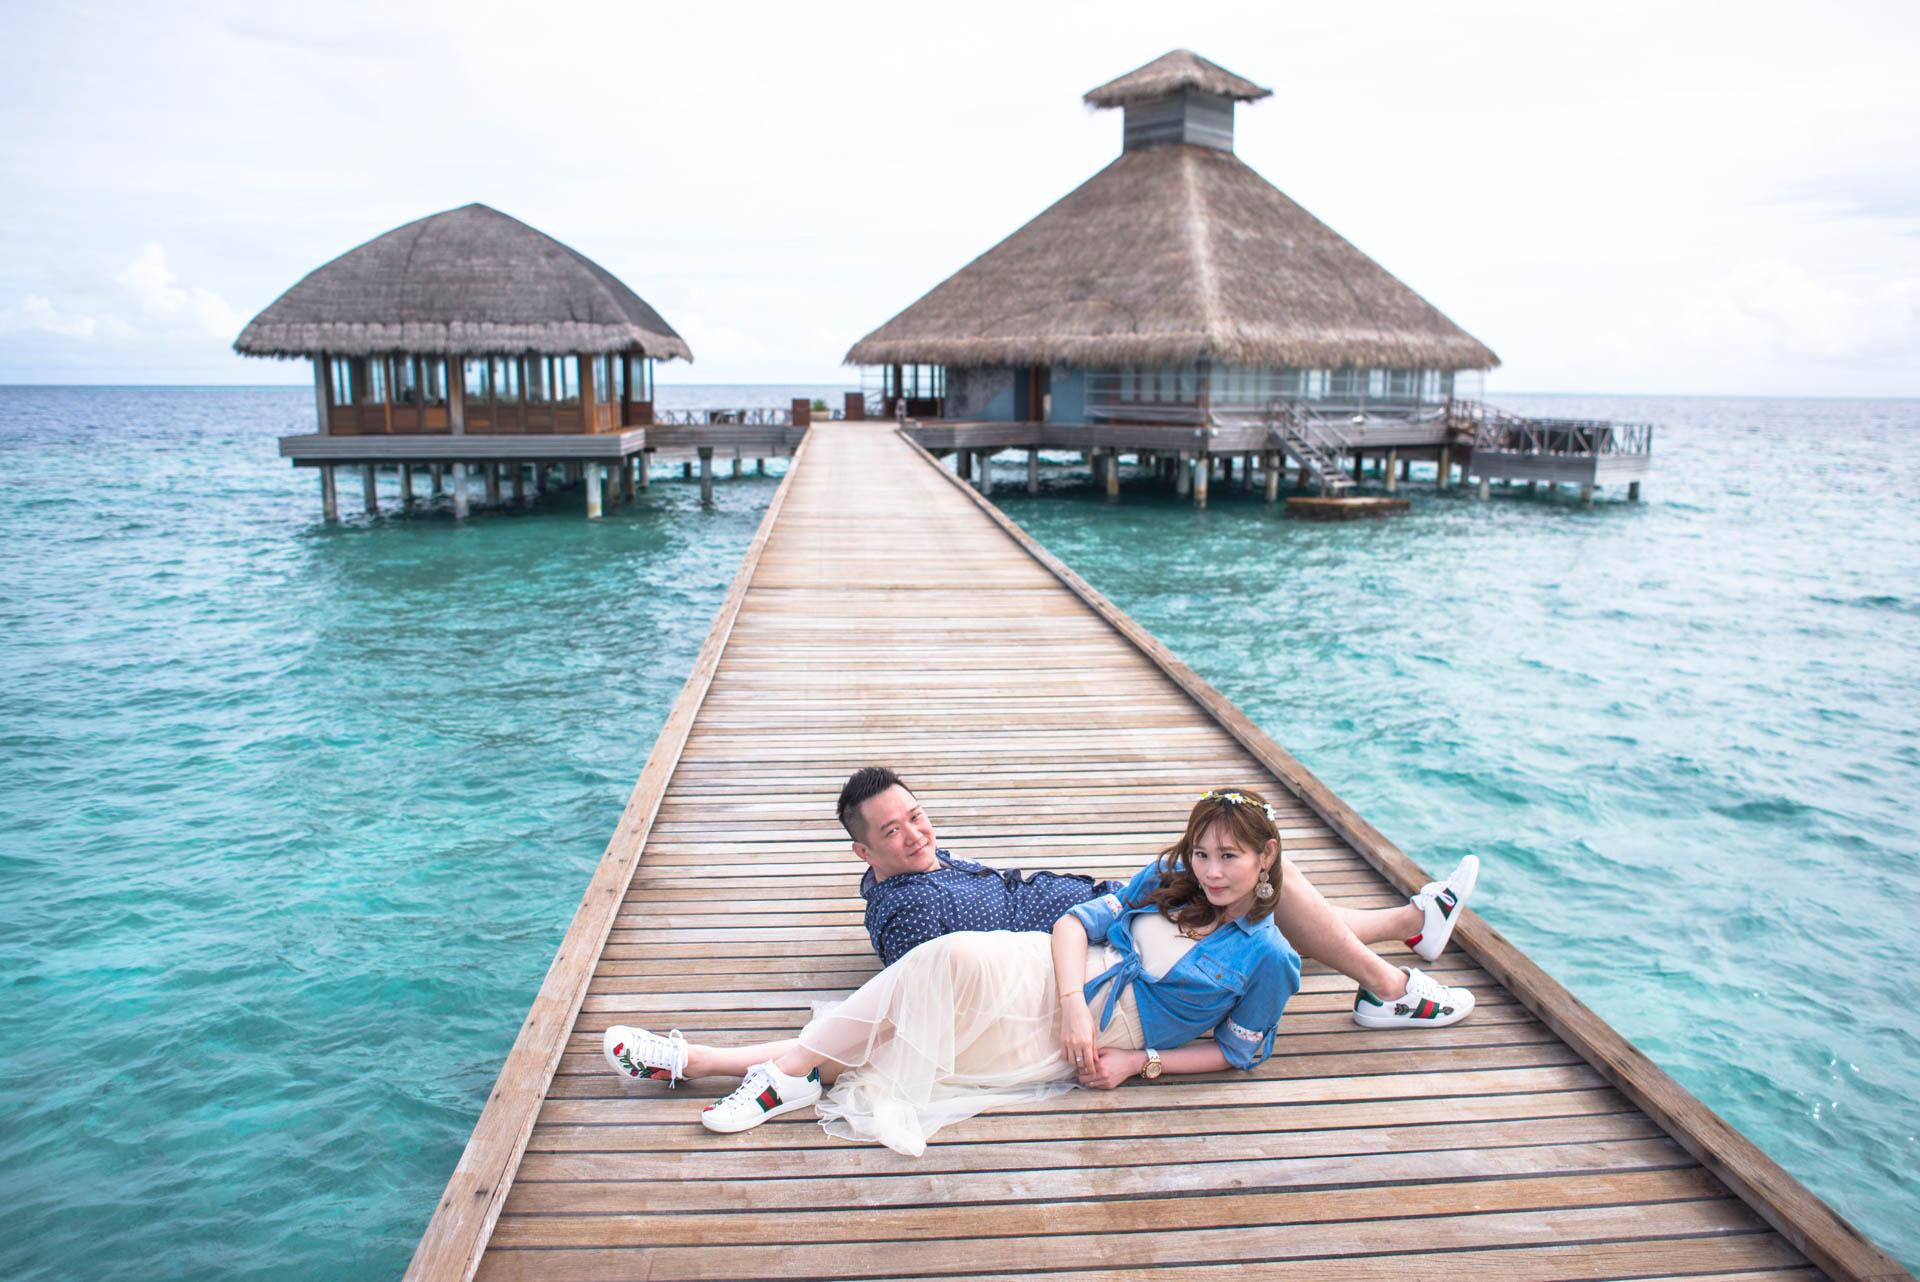 Chin Siew and Chin Yee Honeymoon in Maldives at Huvafen Fushi Resort Under Water Spa 9